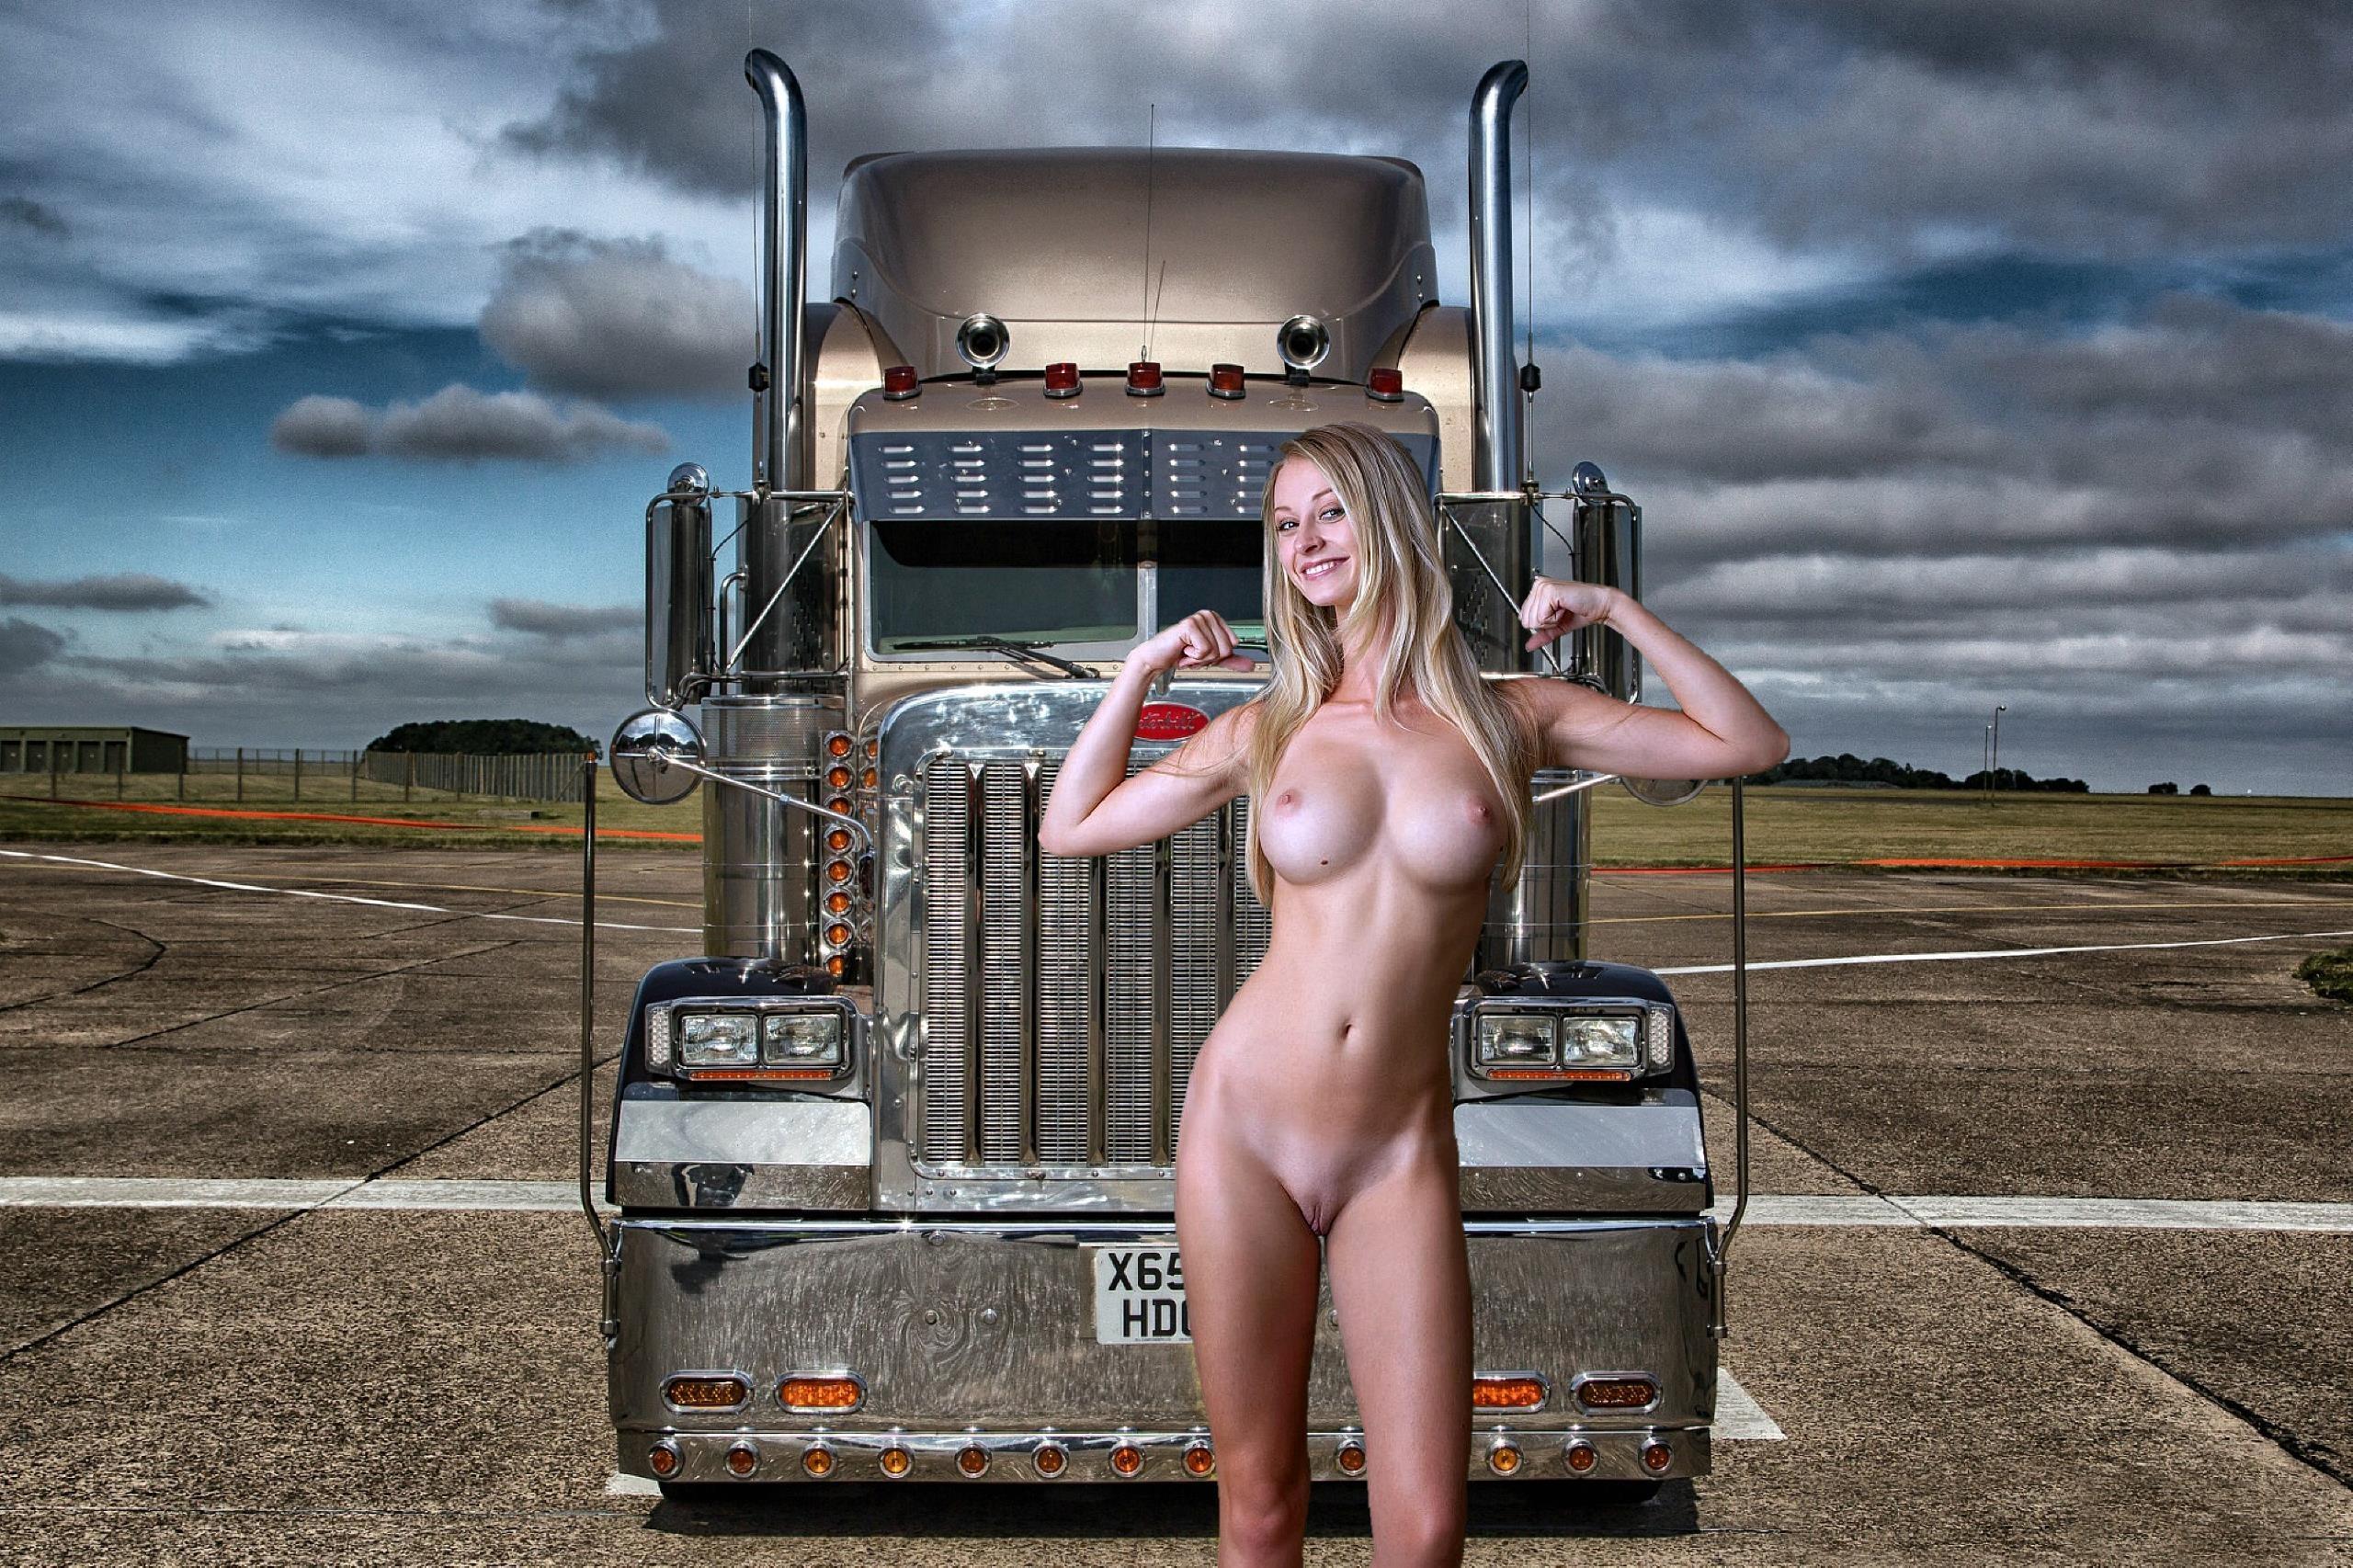 Sexy female bodybuilders nude